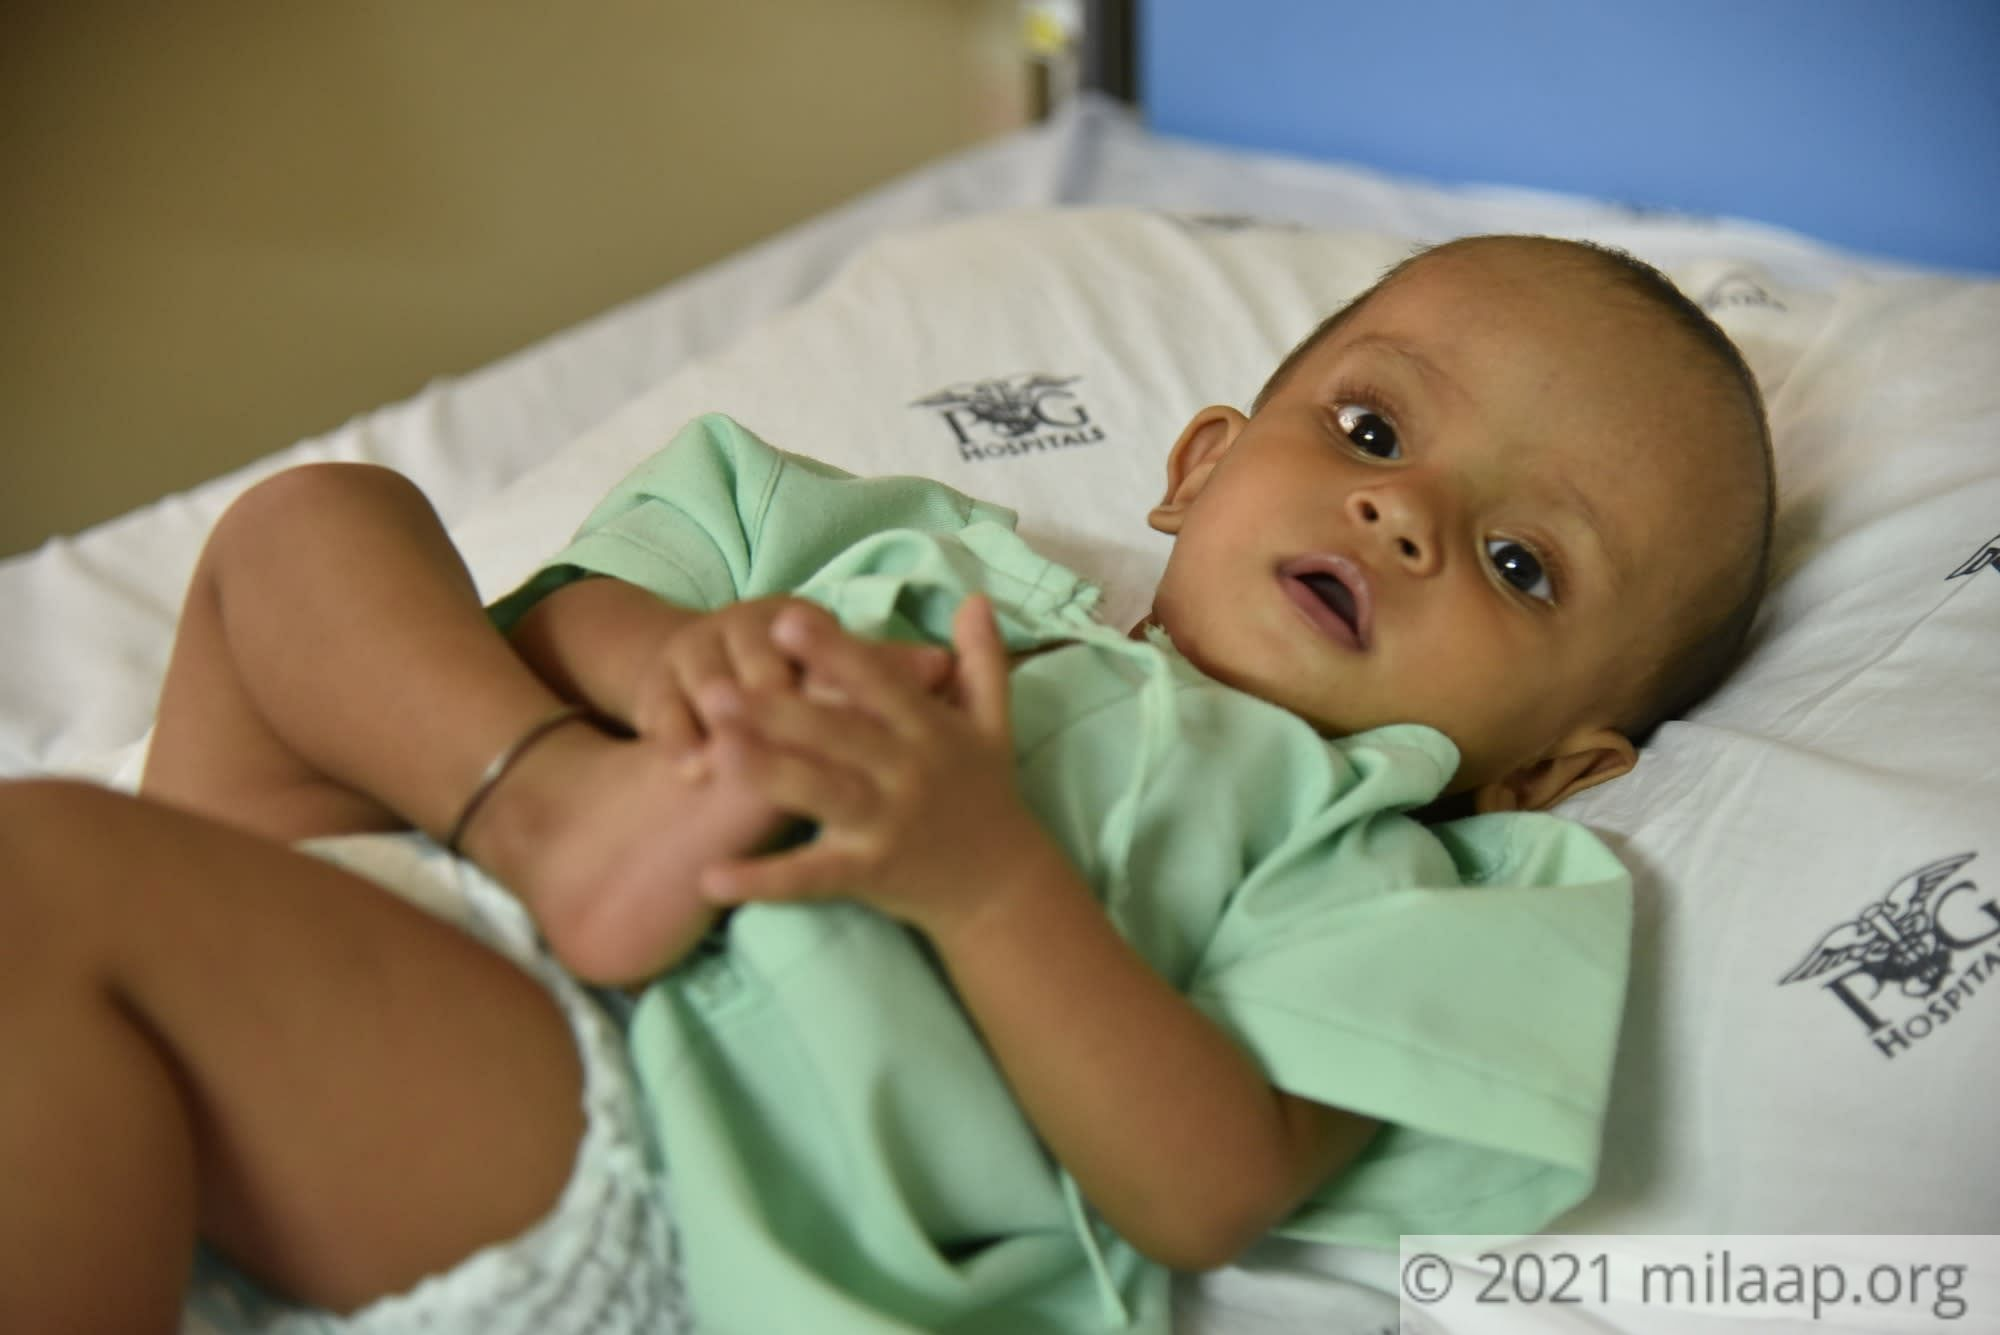 Thahani   psh hospital   coimbatore 2 v1g0tr 1621522494